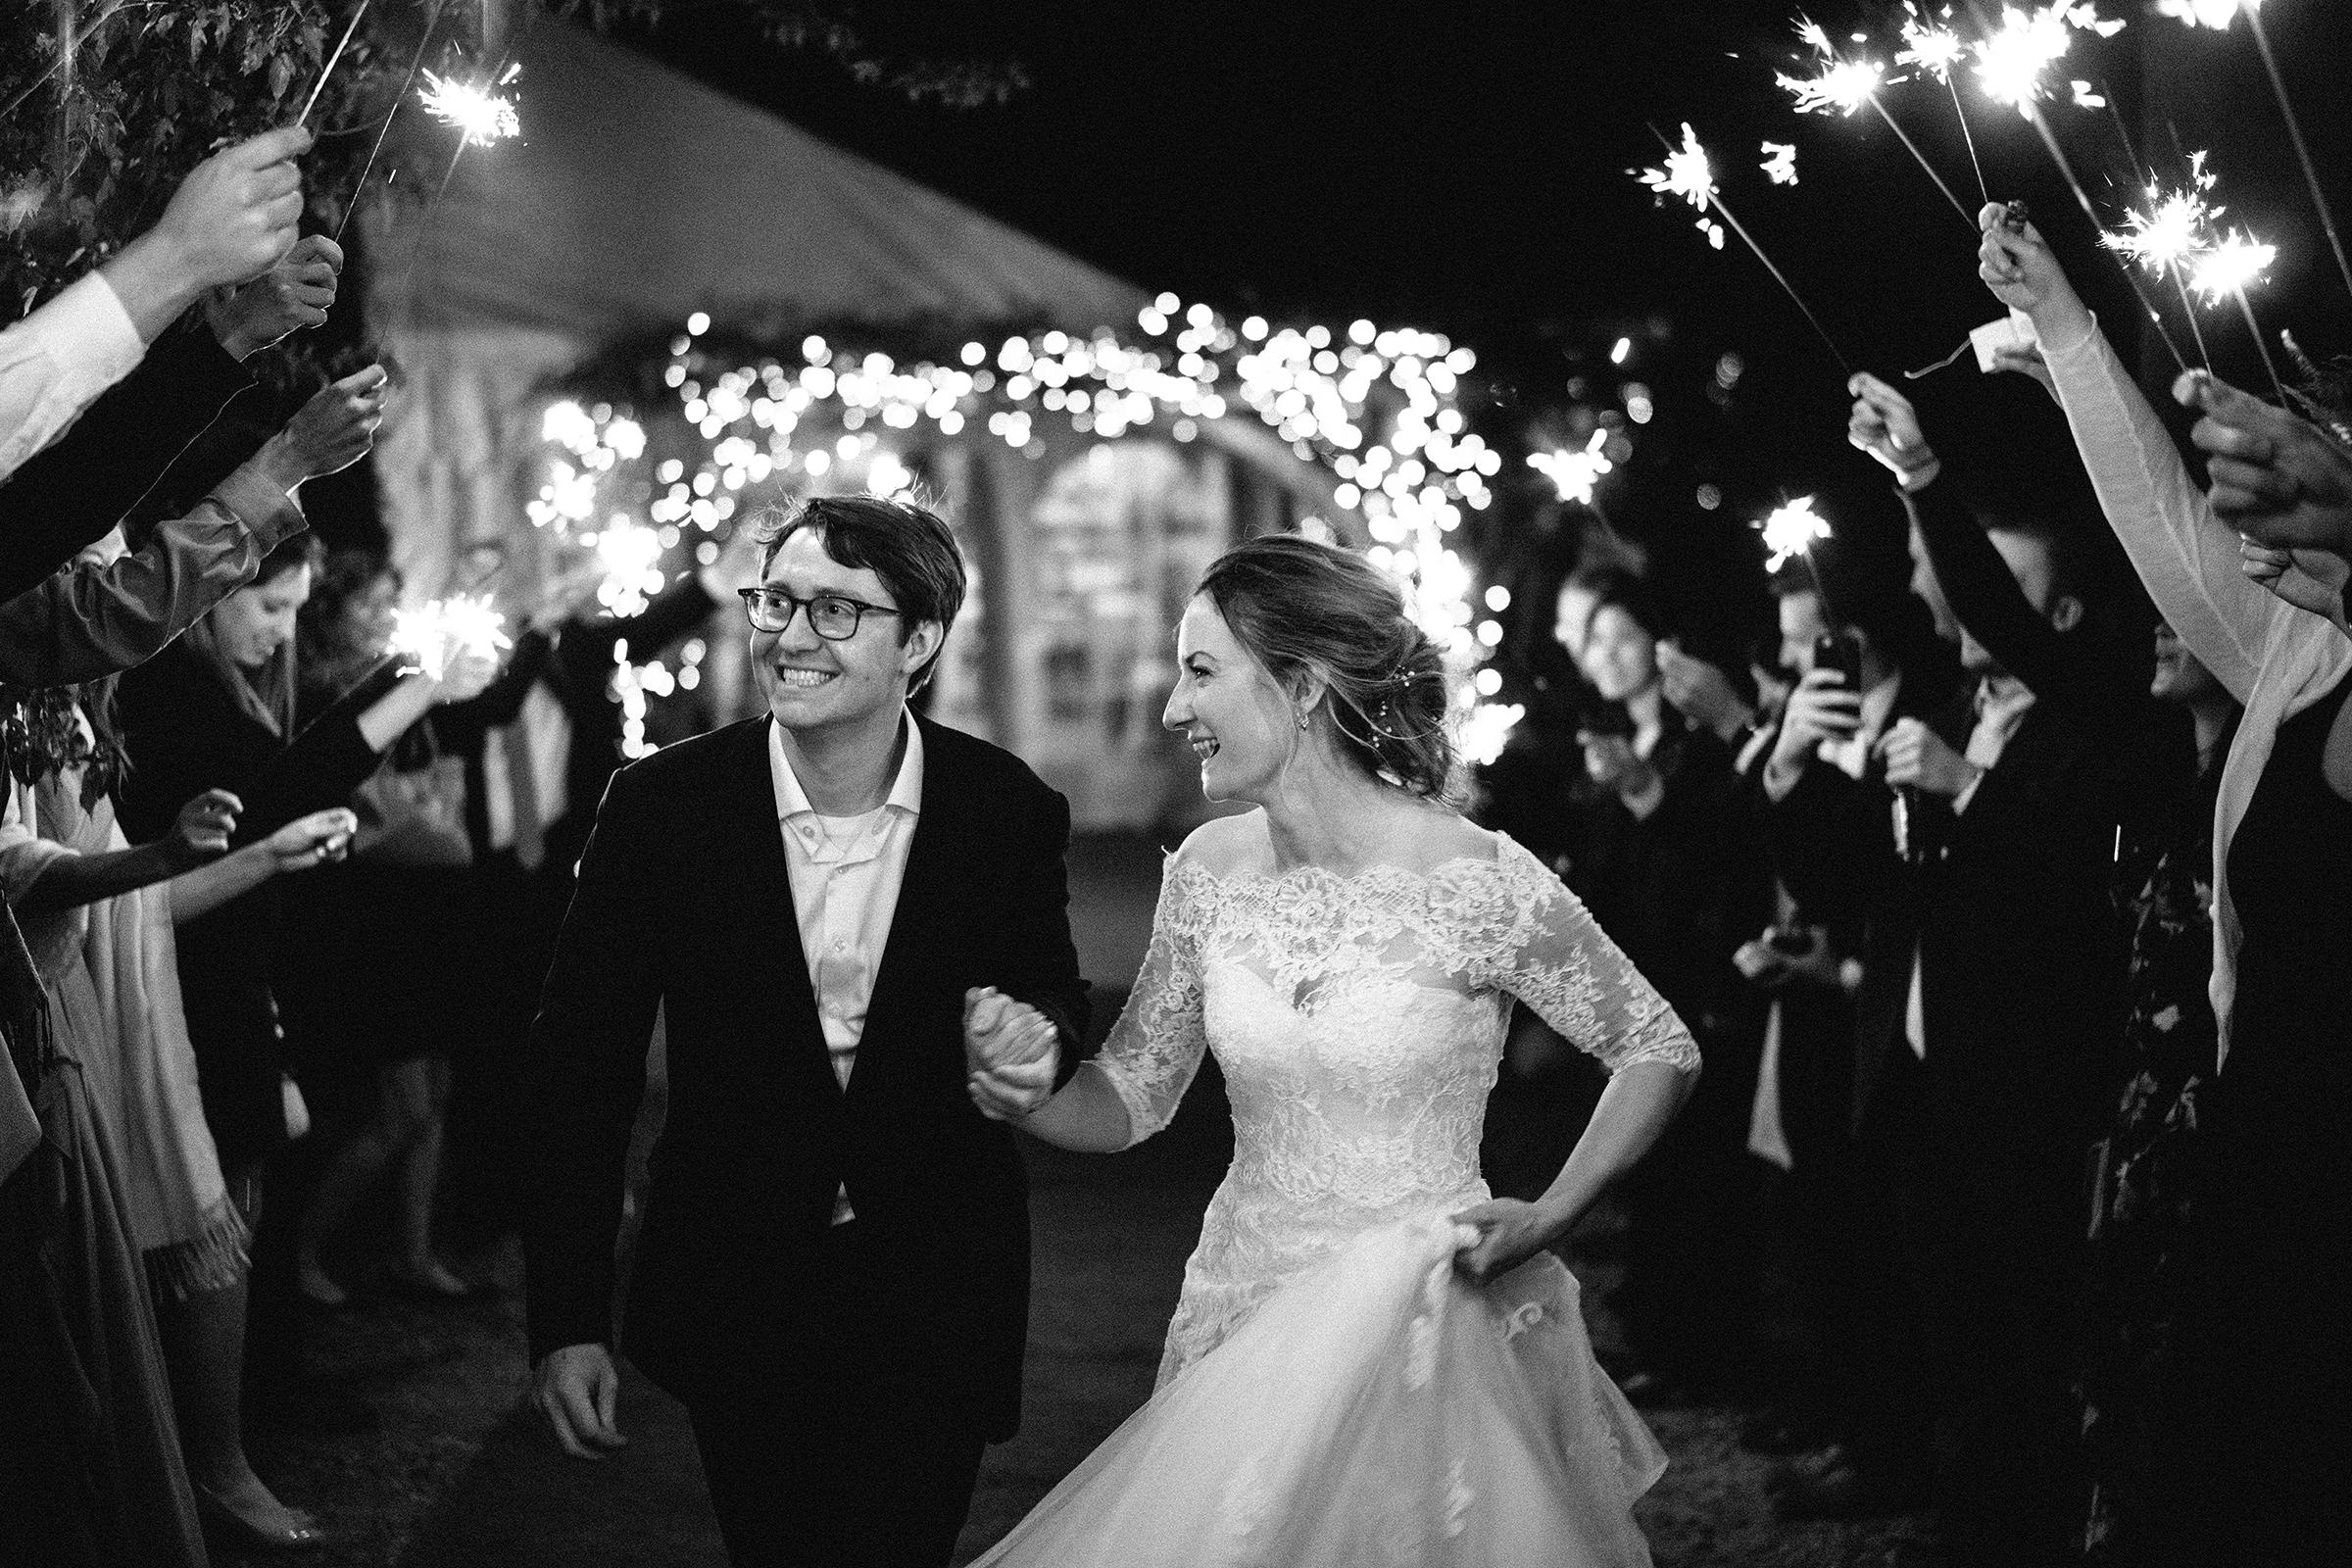 couple-exit-under-sparklers-bradley-hanson-photography